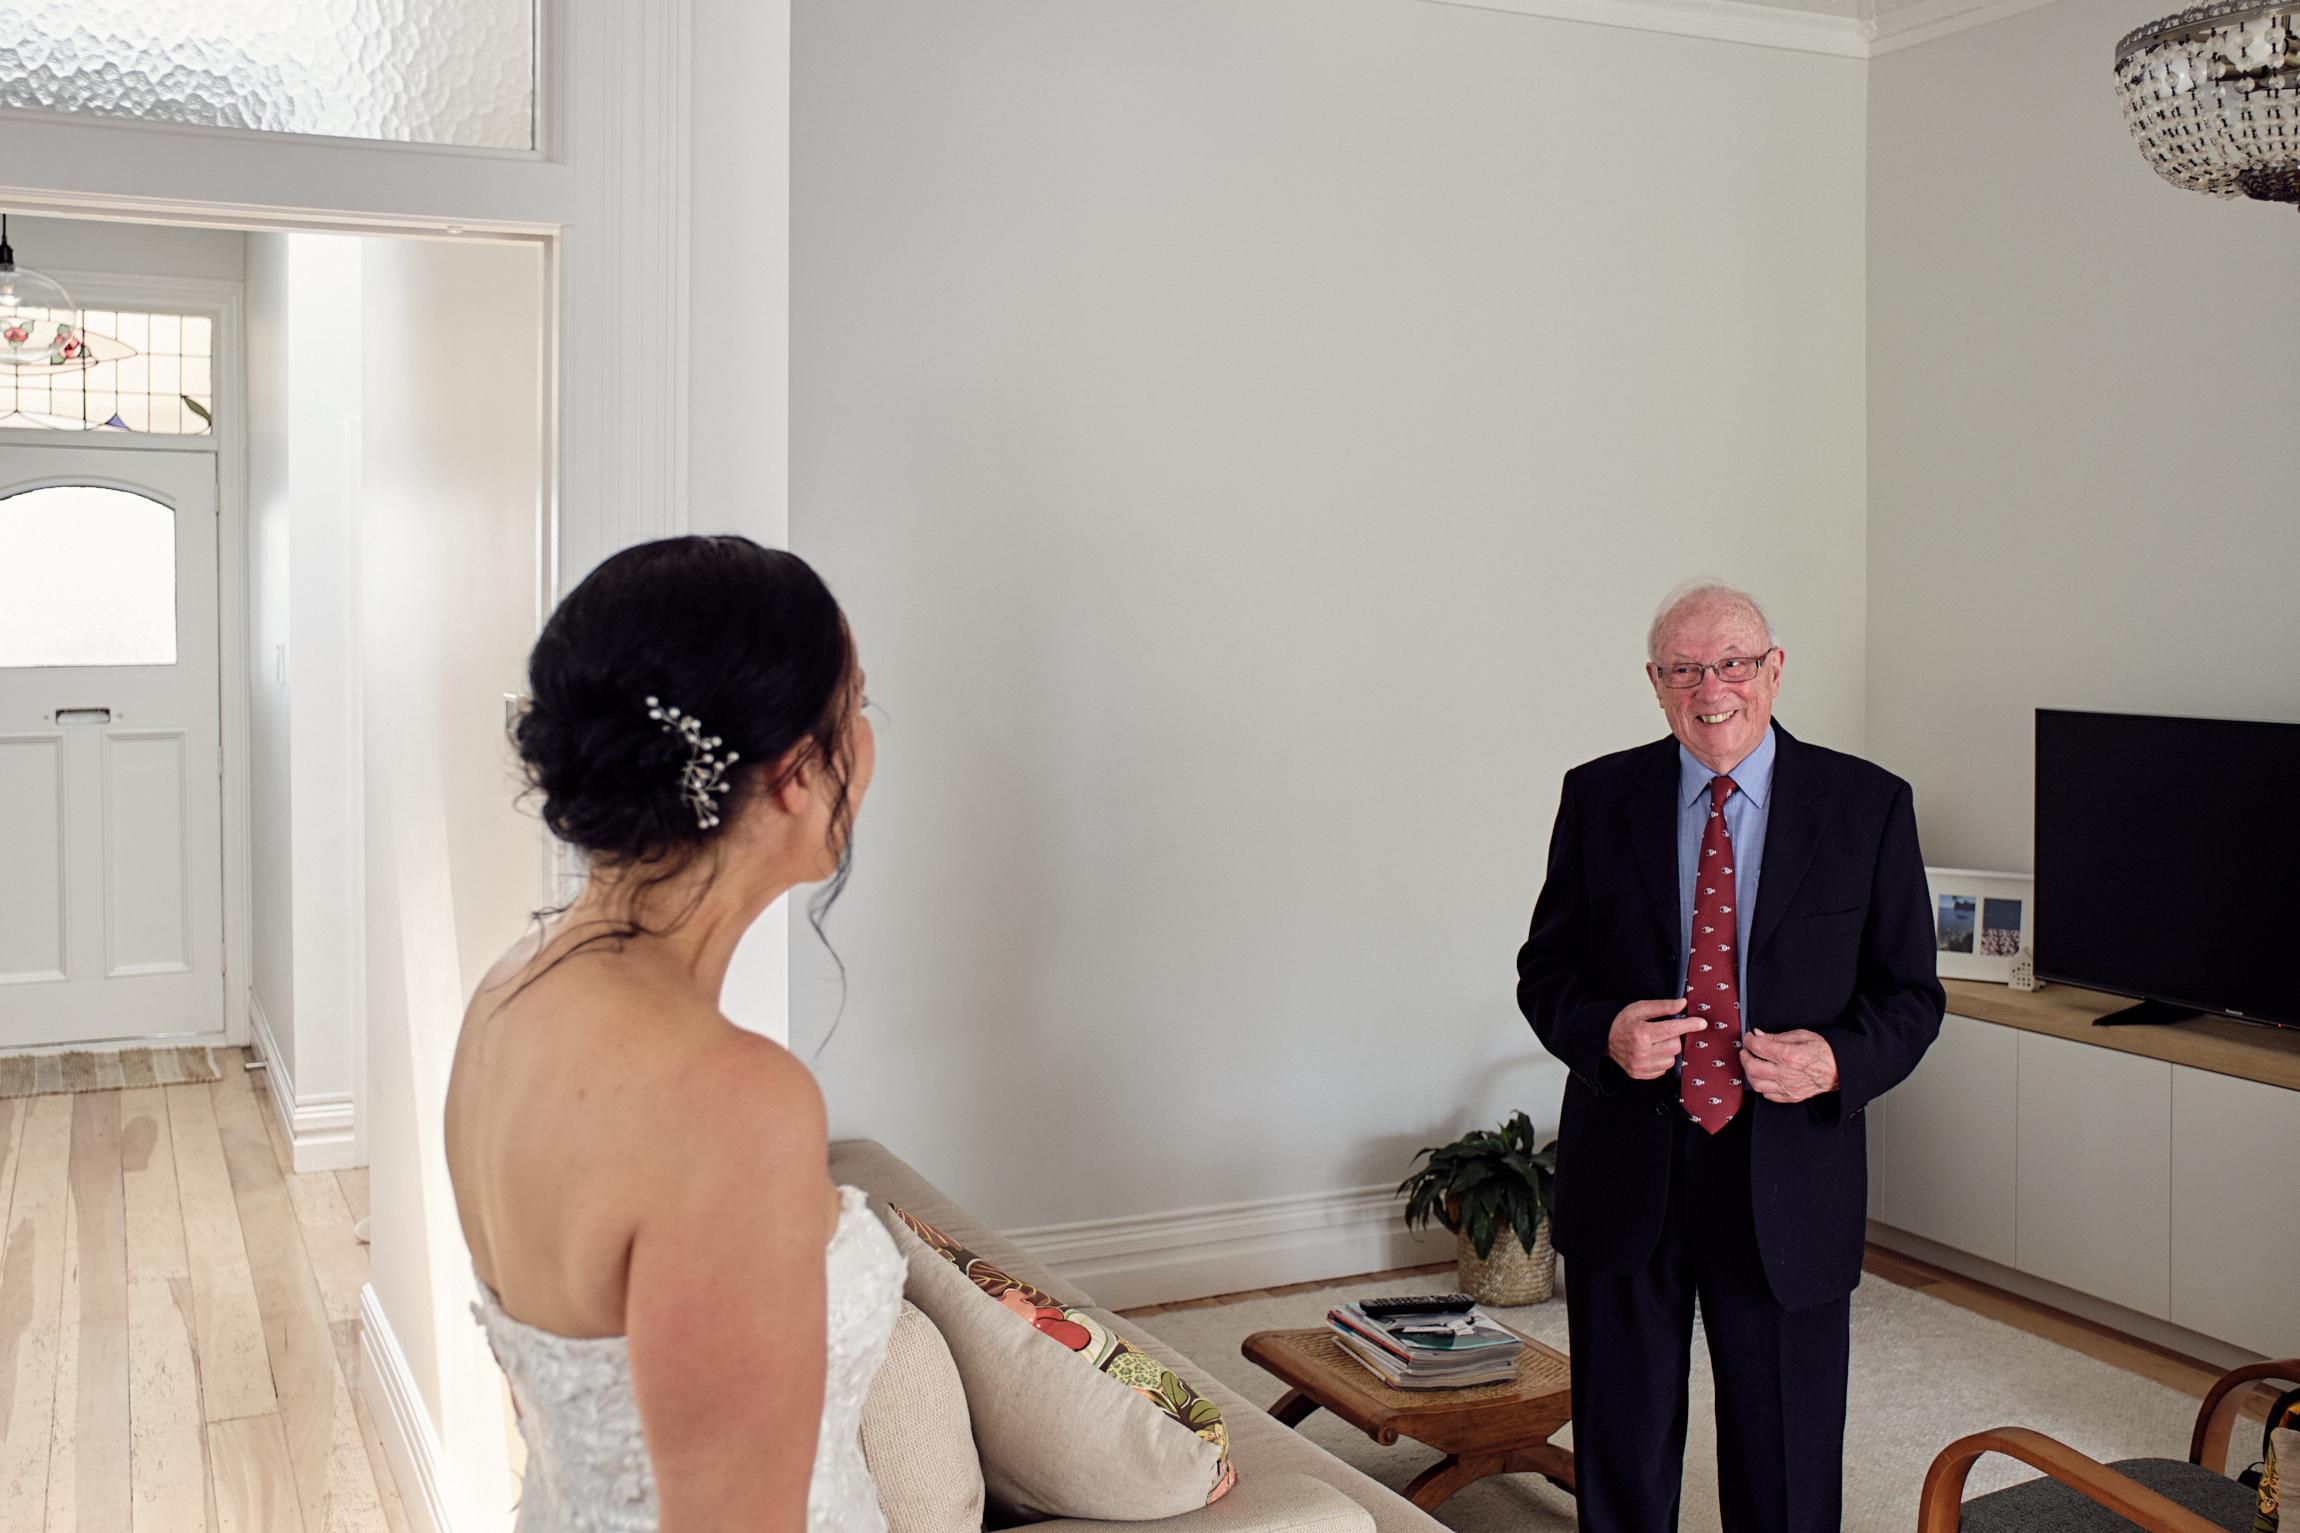 Real wedding photography